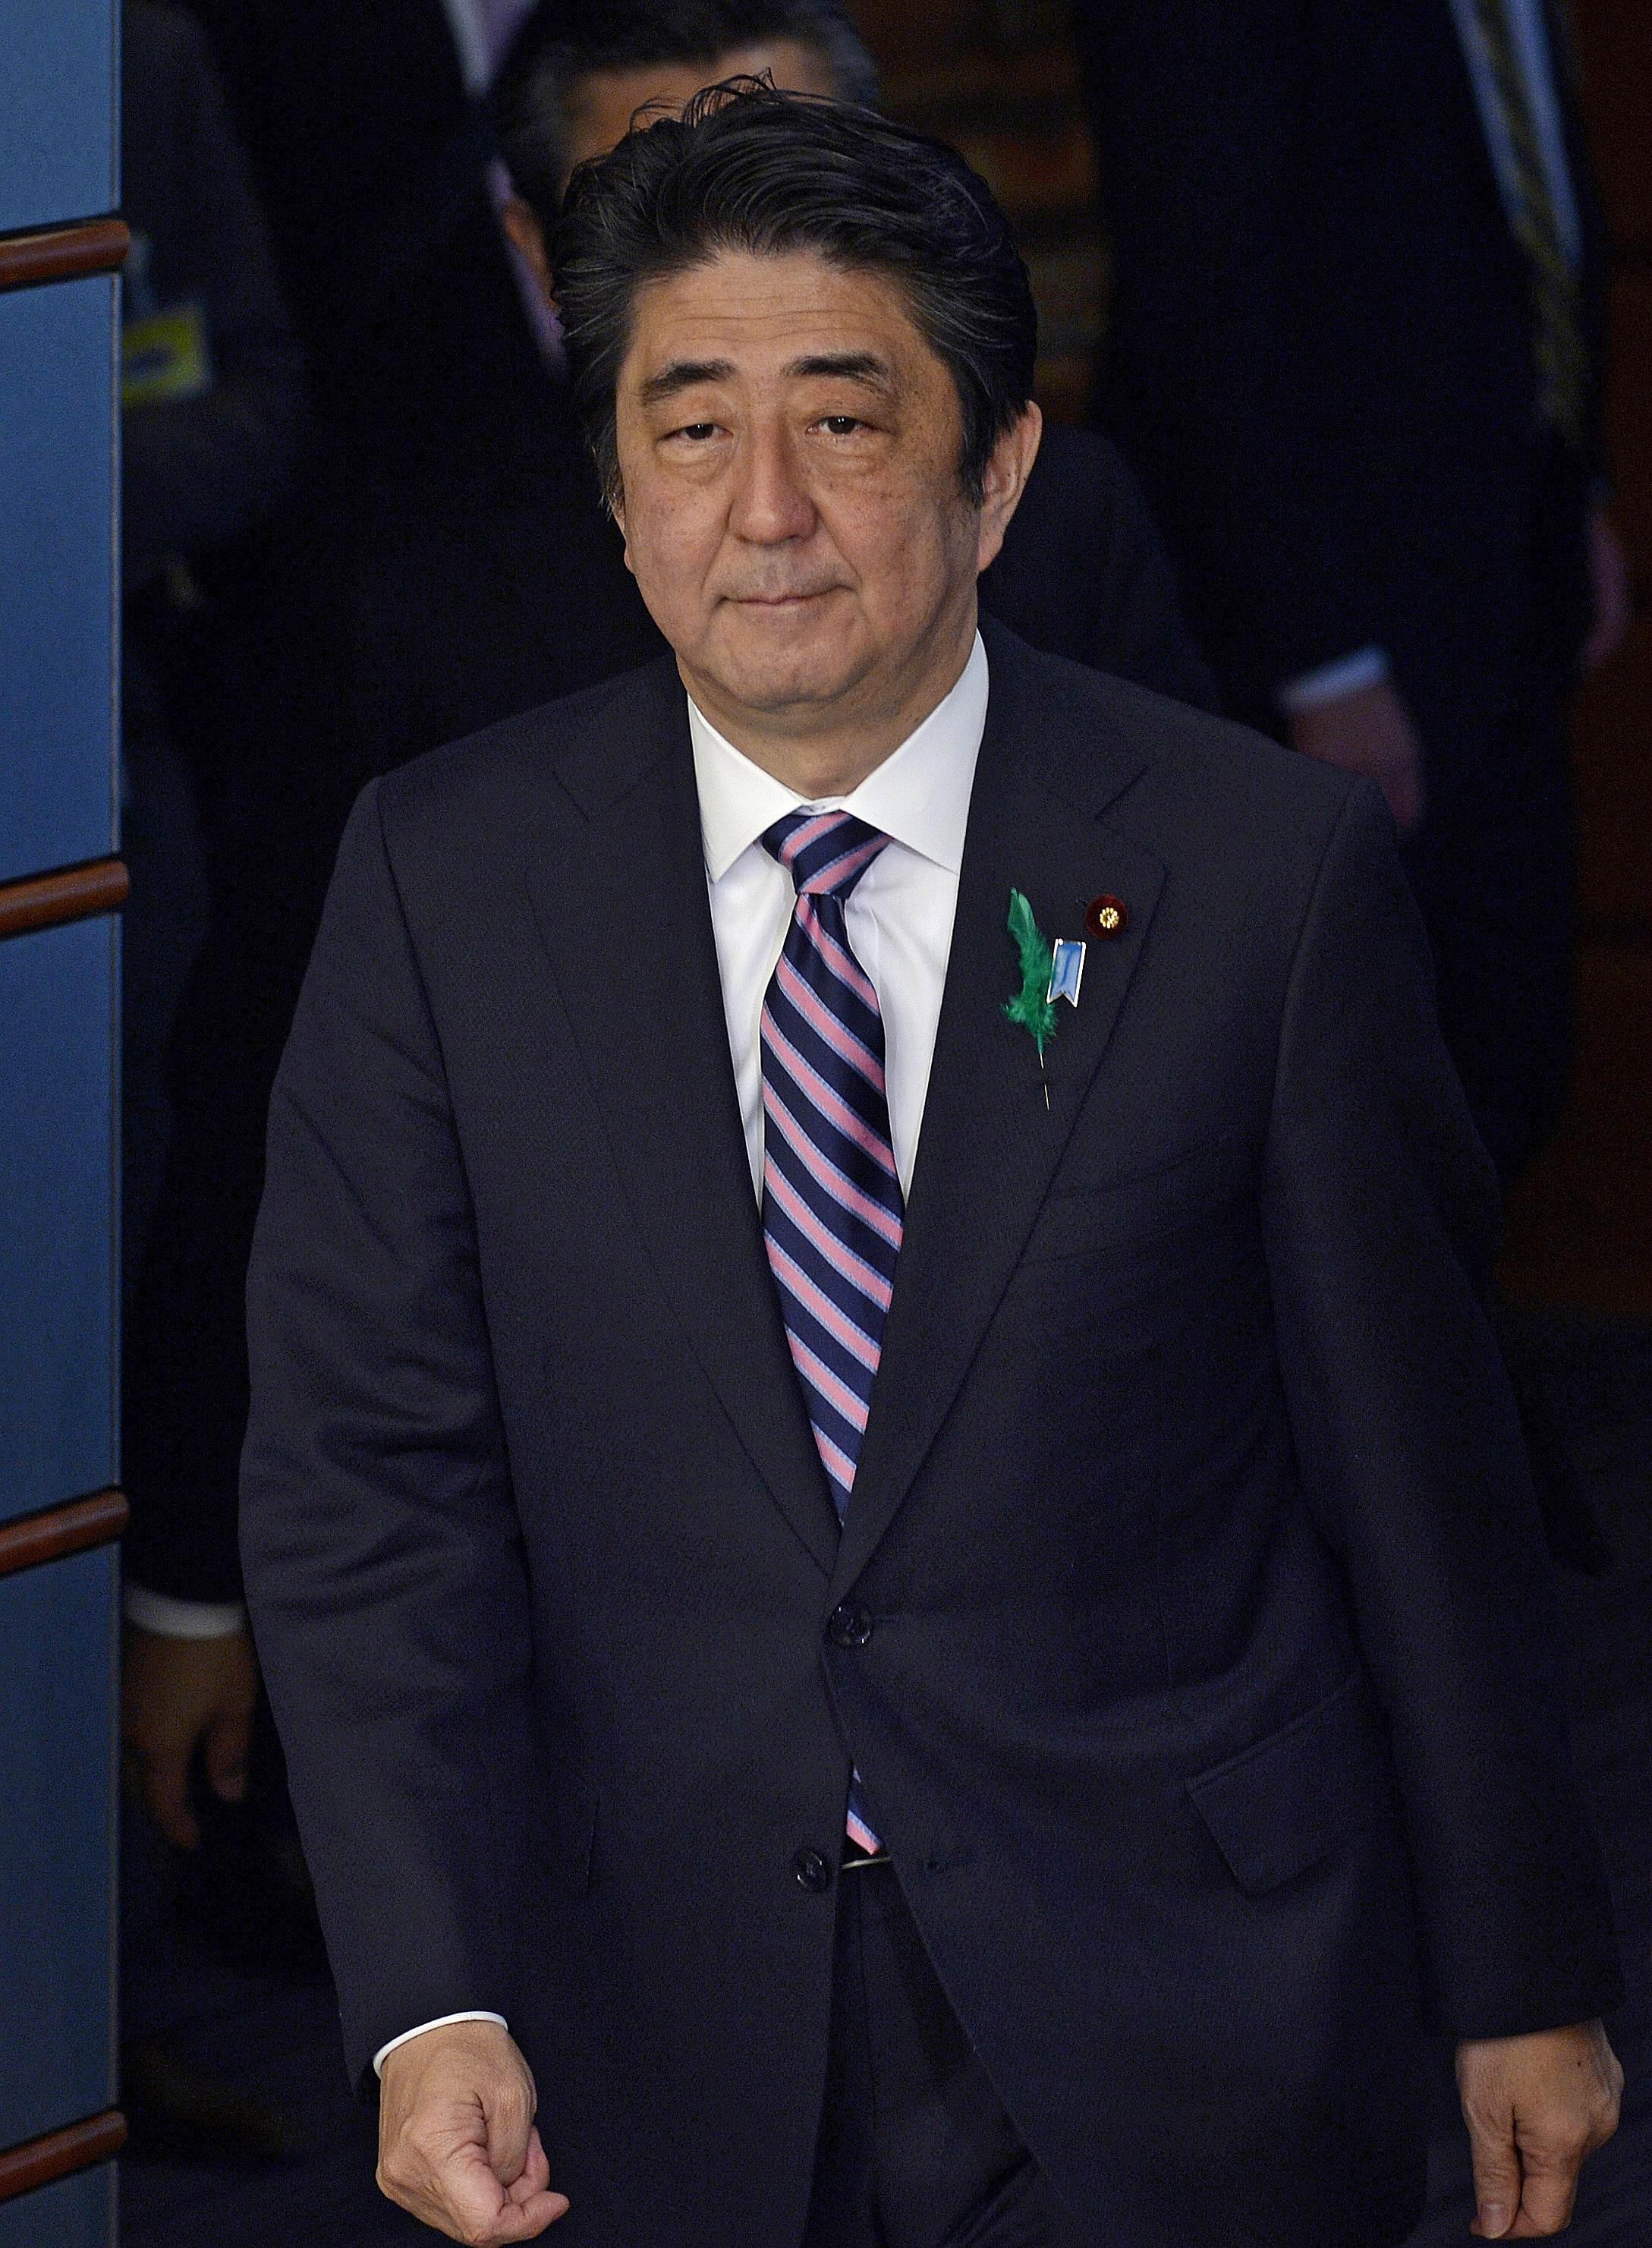 Minister Abe sends Yasukuni war Prime to but shrine Japan offering ZHRpxw5npq